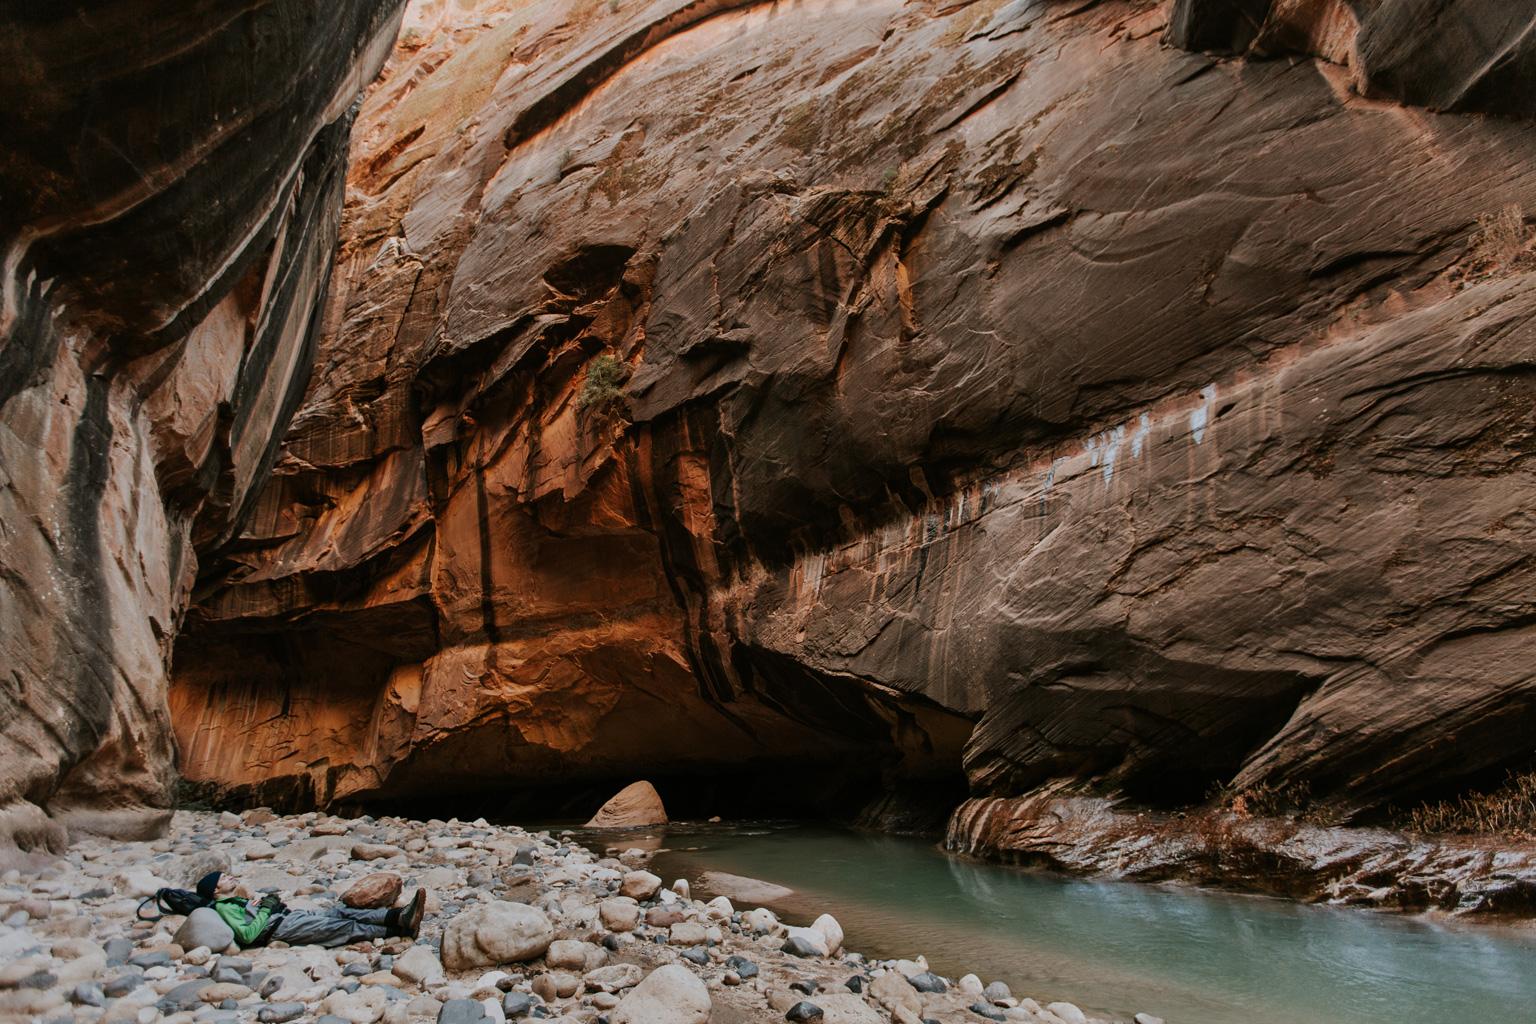 CindyGiovagnoli_Zion_National_Park_Utah_Narrows_hike_winter-012.jpg